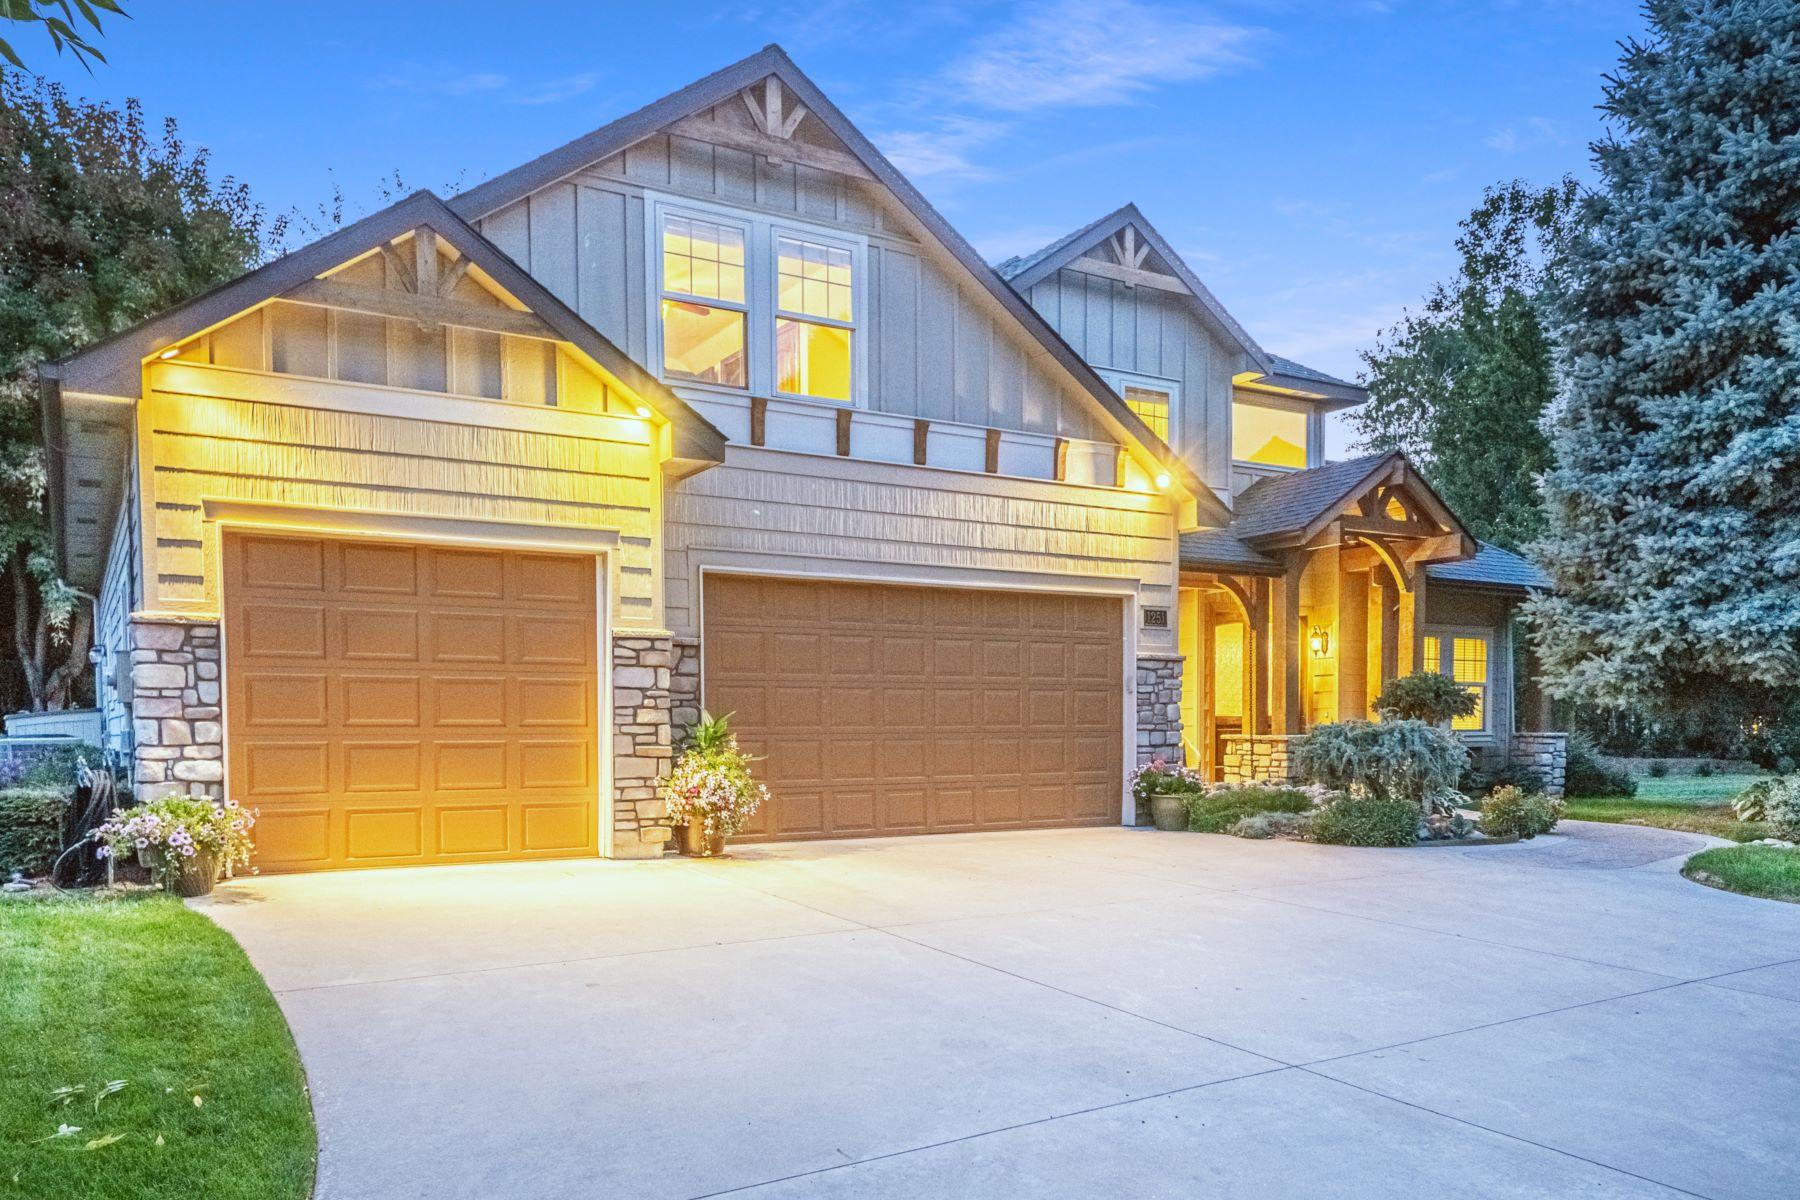 Single Family Homes pour l Vente à 1251 Arbor Island Place, Eagle 1251 S Arbor Island Pl Eagle, Idaho 83616 États-Unis